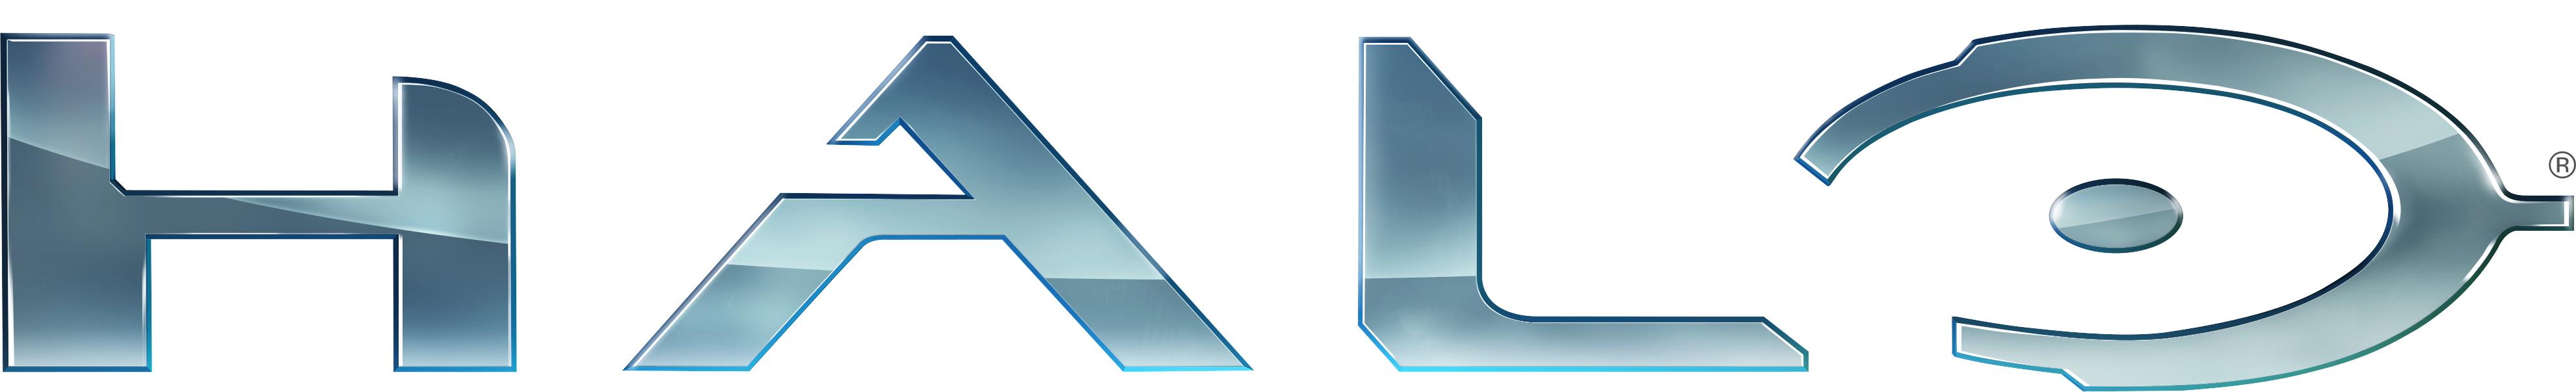 Halo logo (2010-present).png